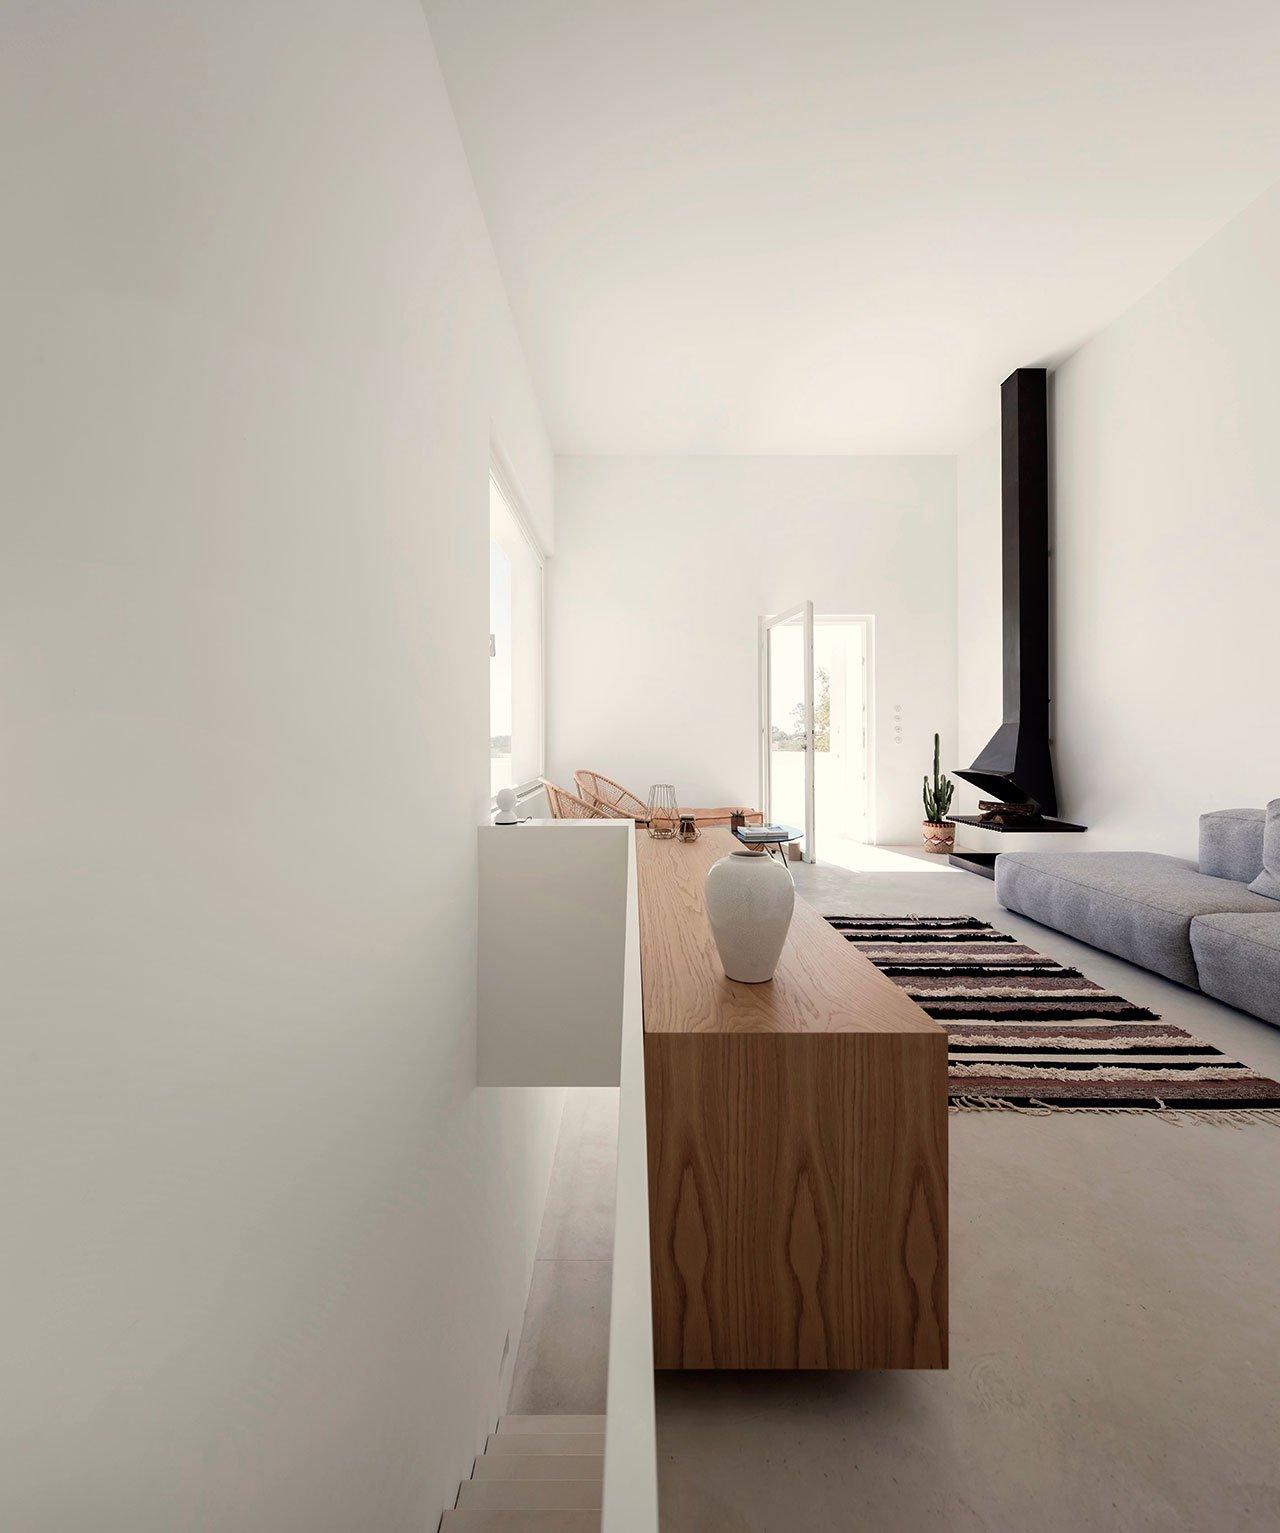 casa-luum-minimalizmus-a-portugal-videken-noko-027.jpg